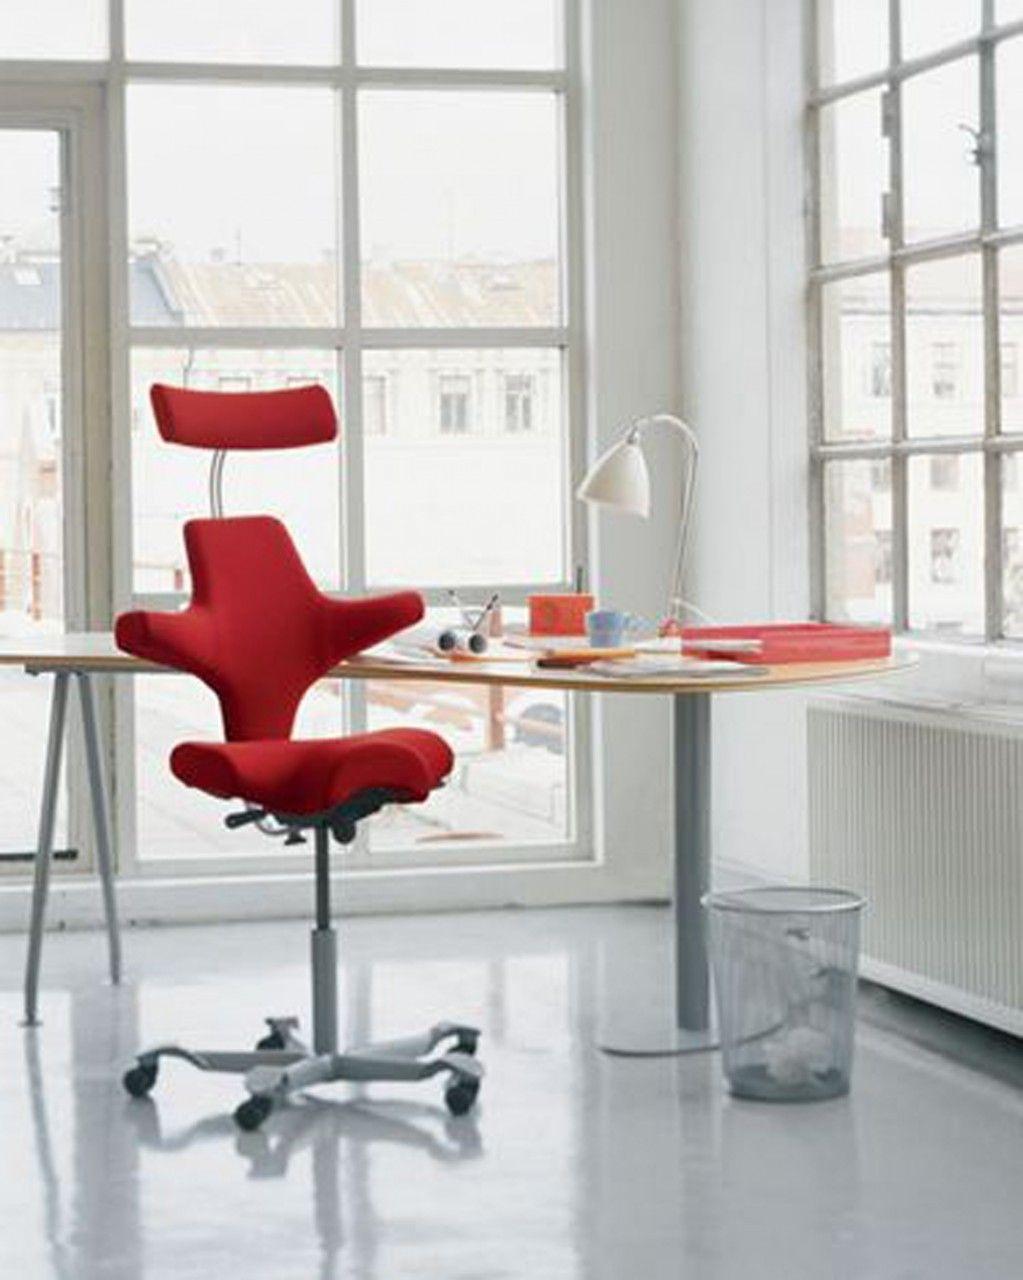 Hag 8106 Capisco Classic Saddle Seat With Back Best Ergonomic Chair Ergonomic Chair Healthcare Furniture